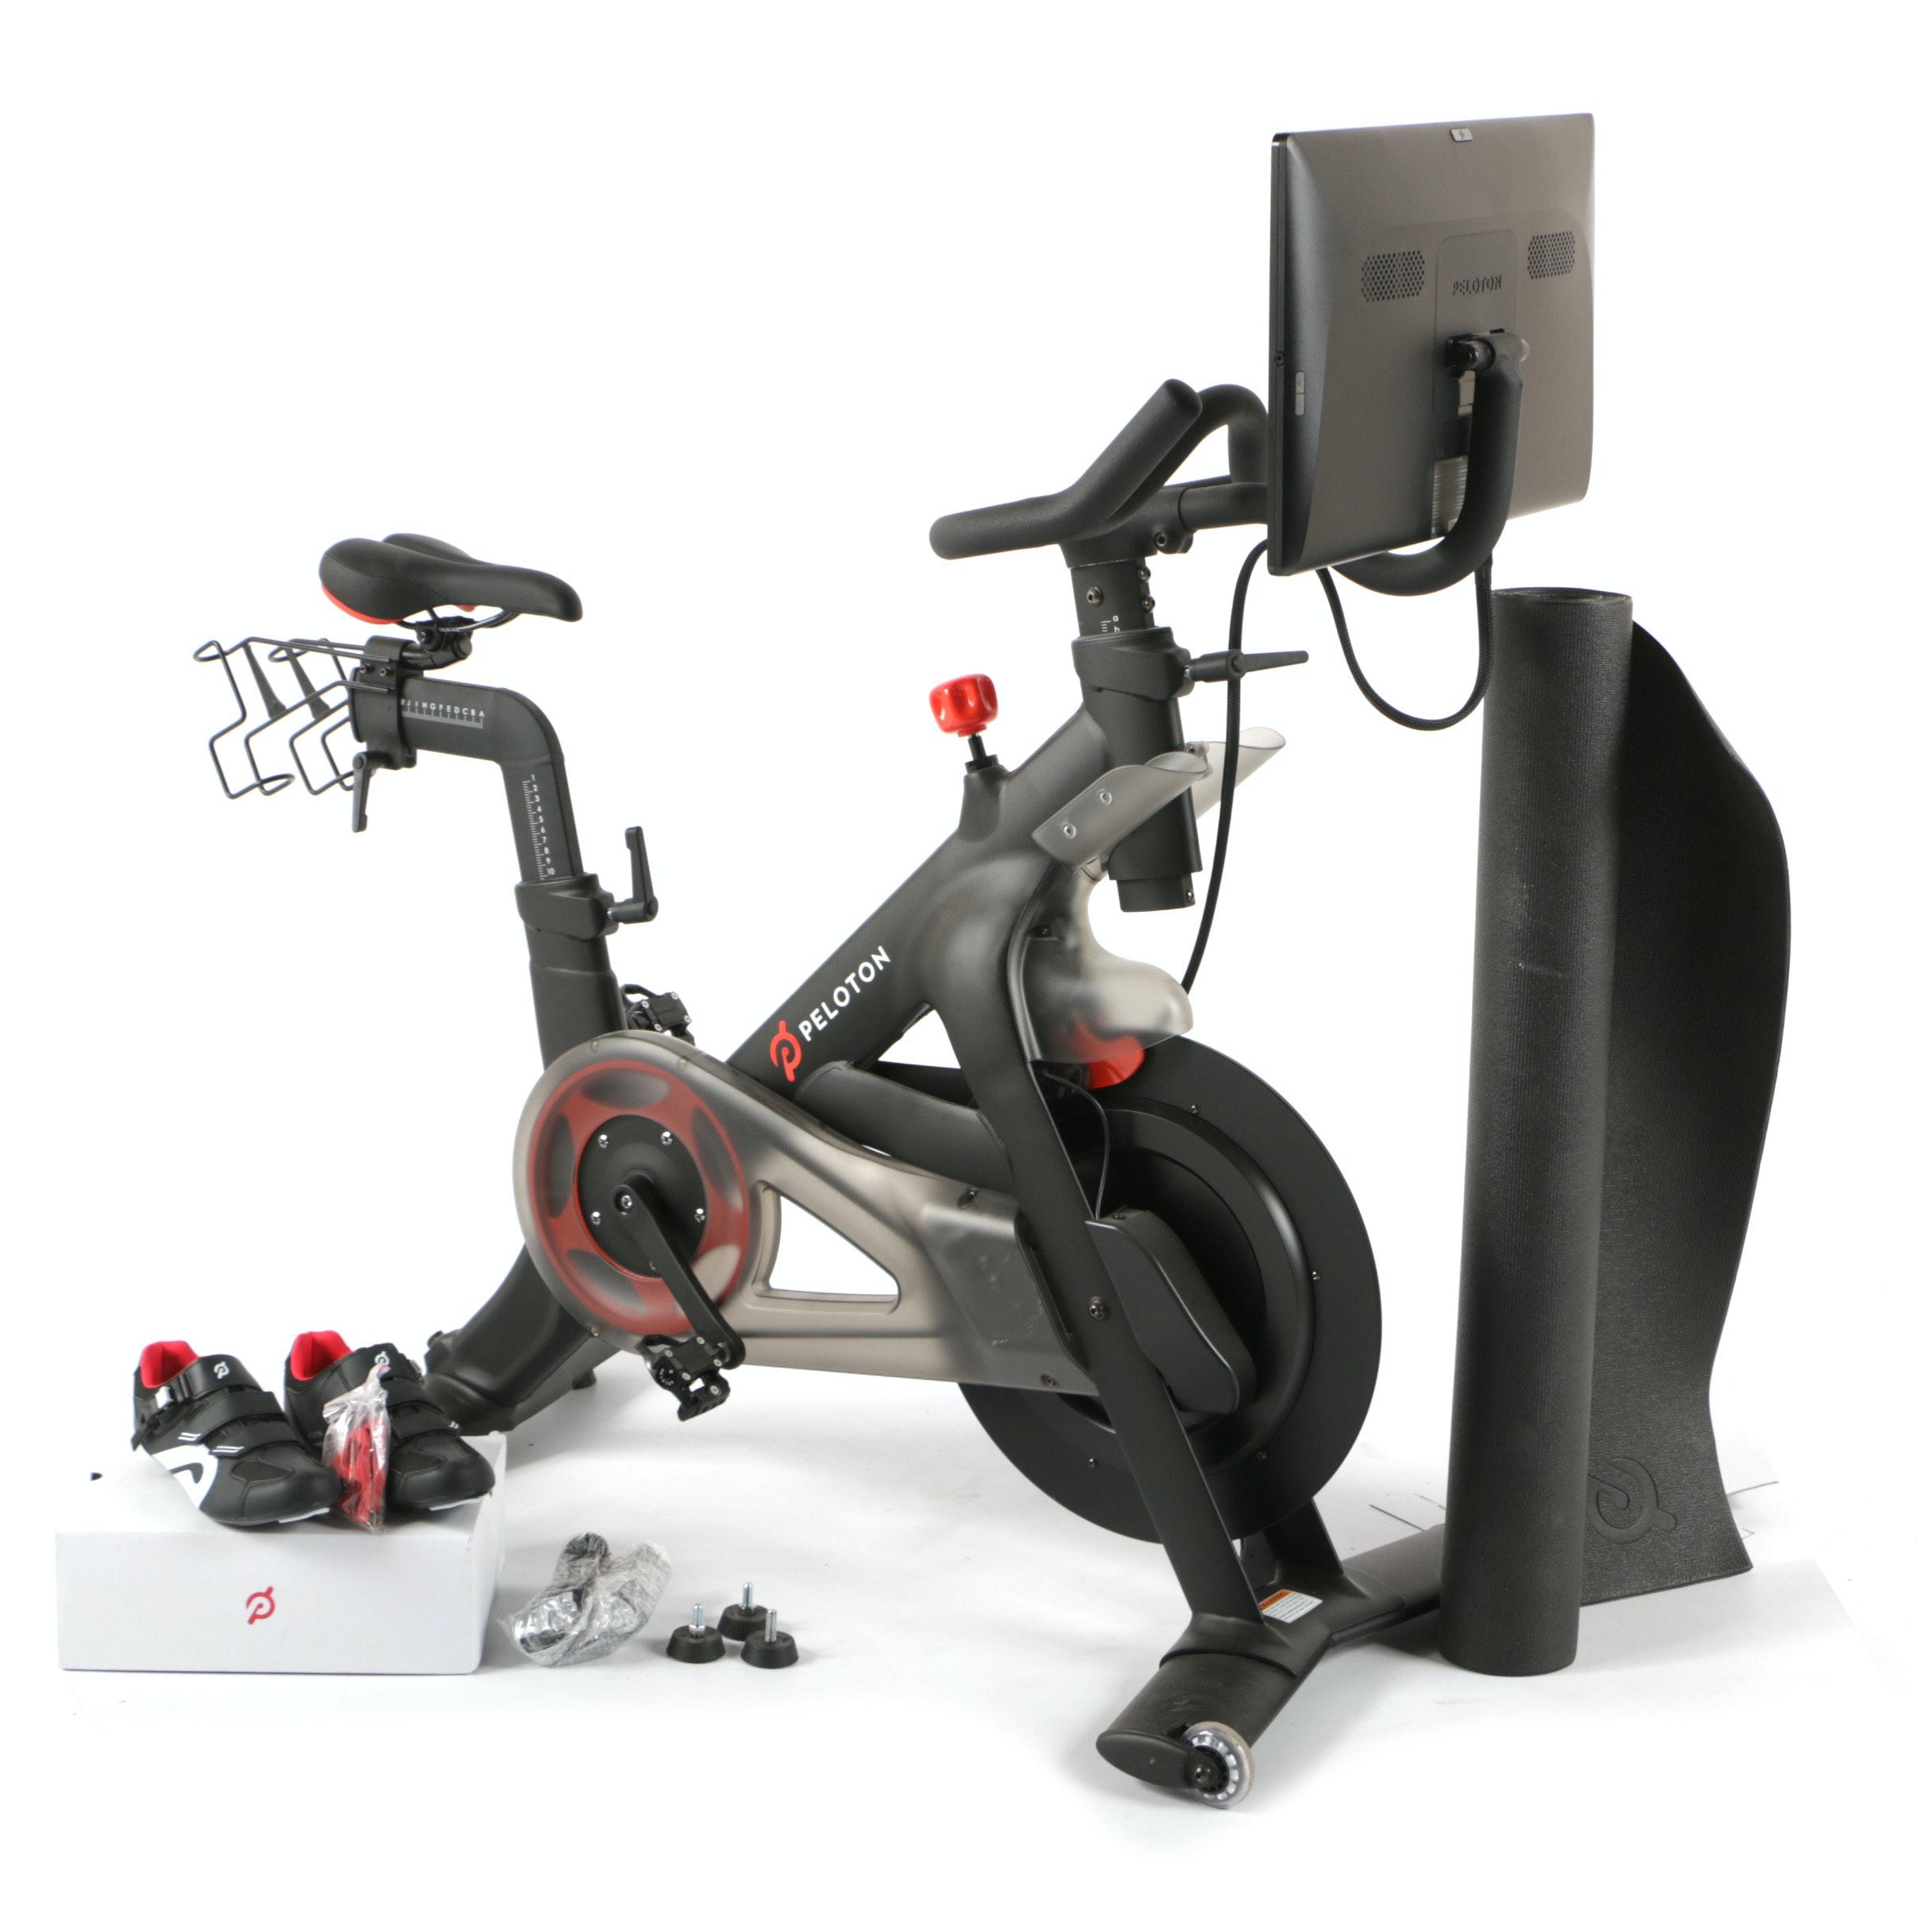 Peloton Indoor Exercise Bike and Accessories